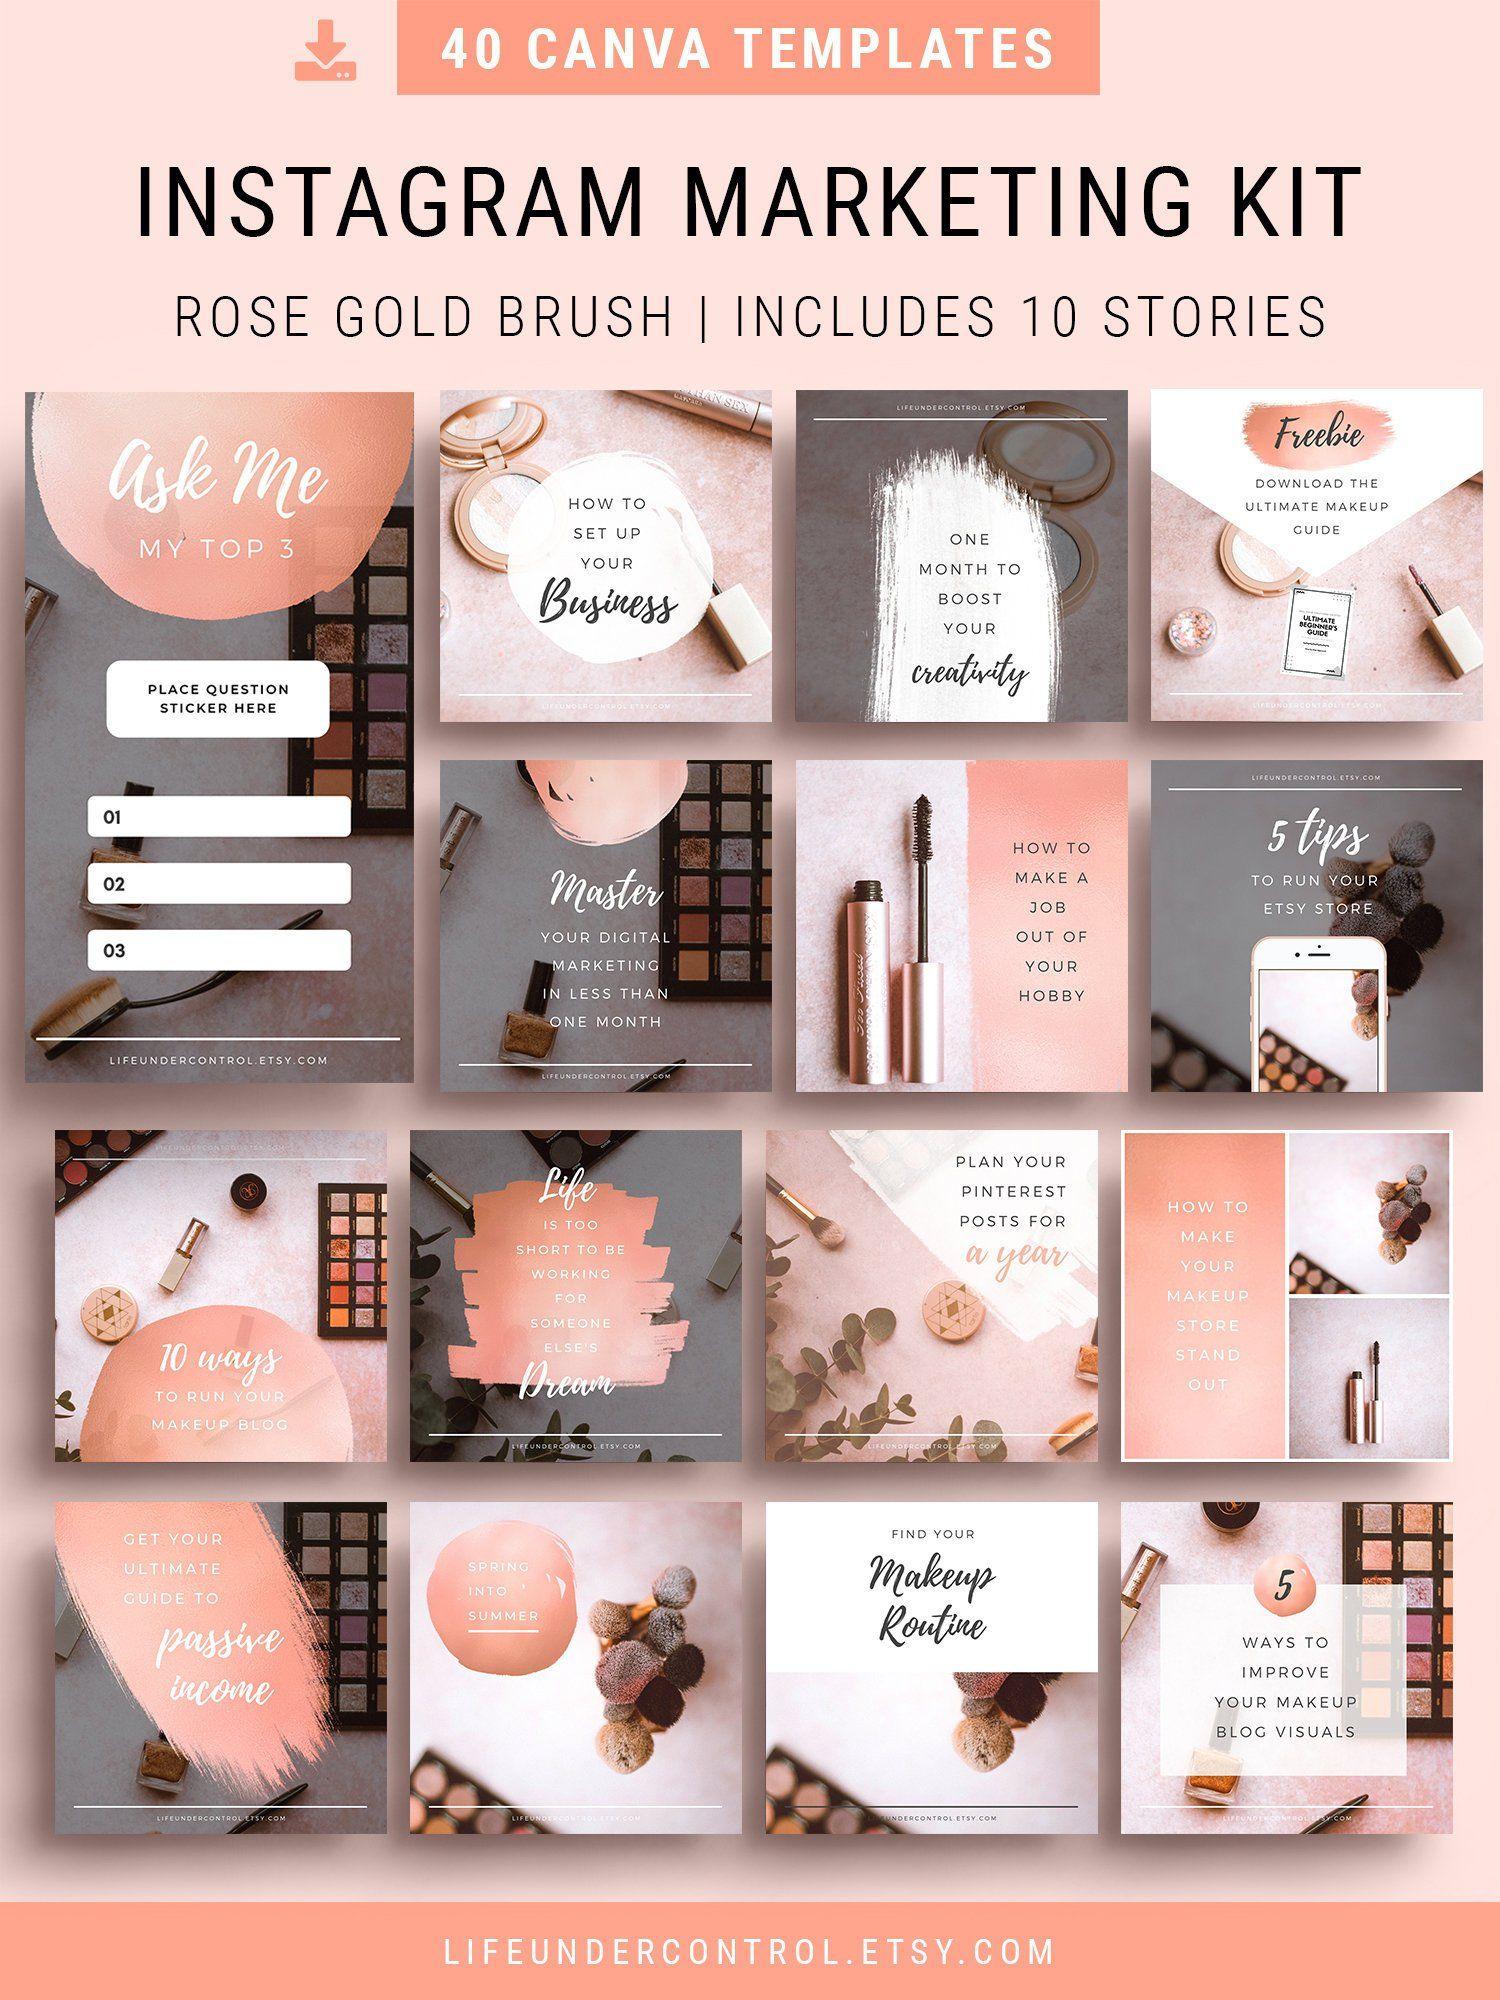 Rose Gold Instagram Kit   40 Editable Canva Templates